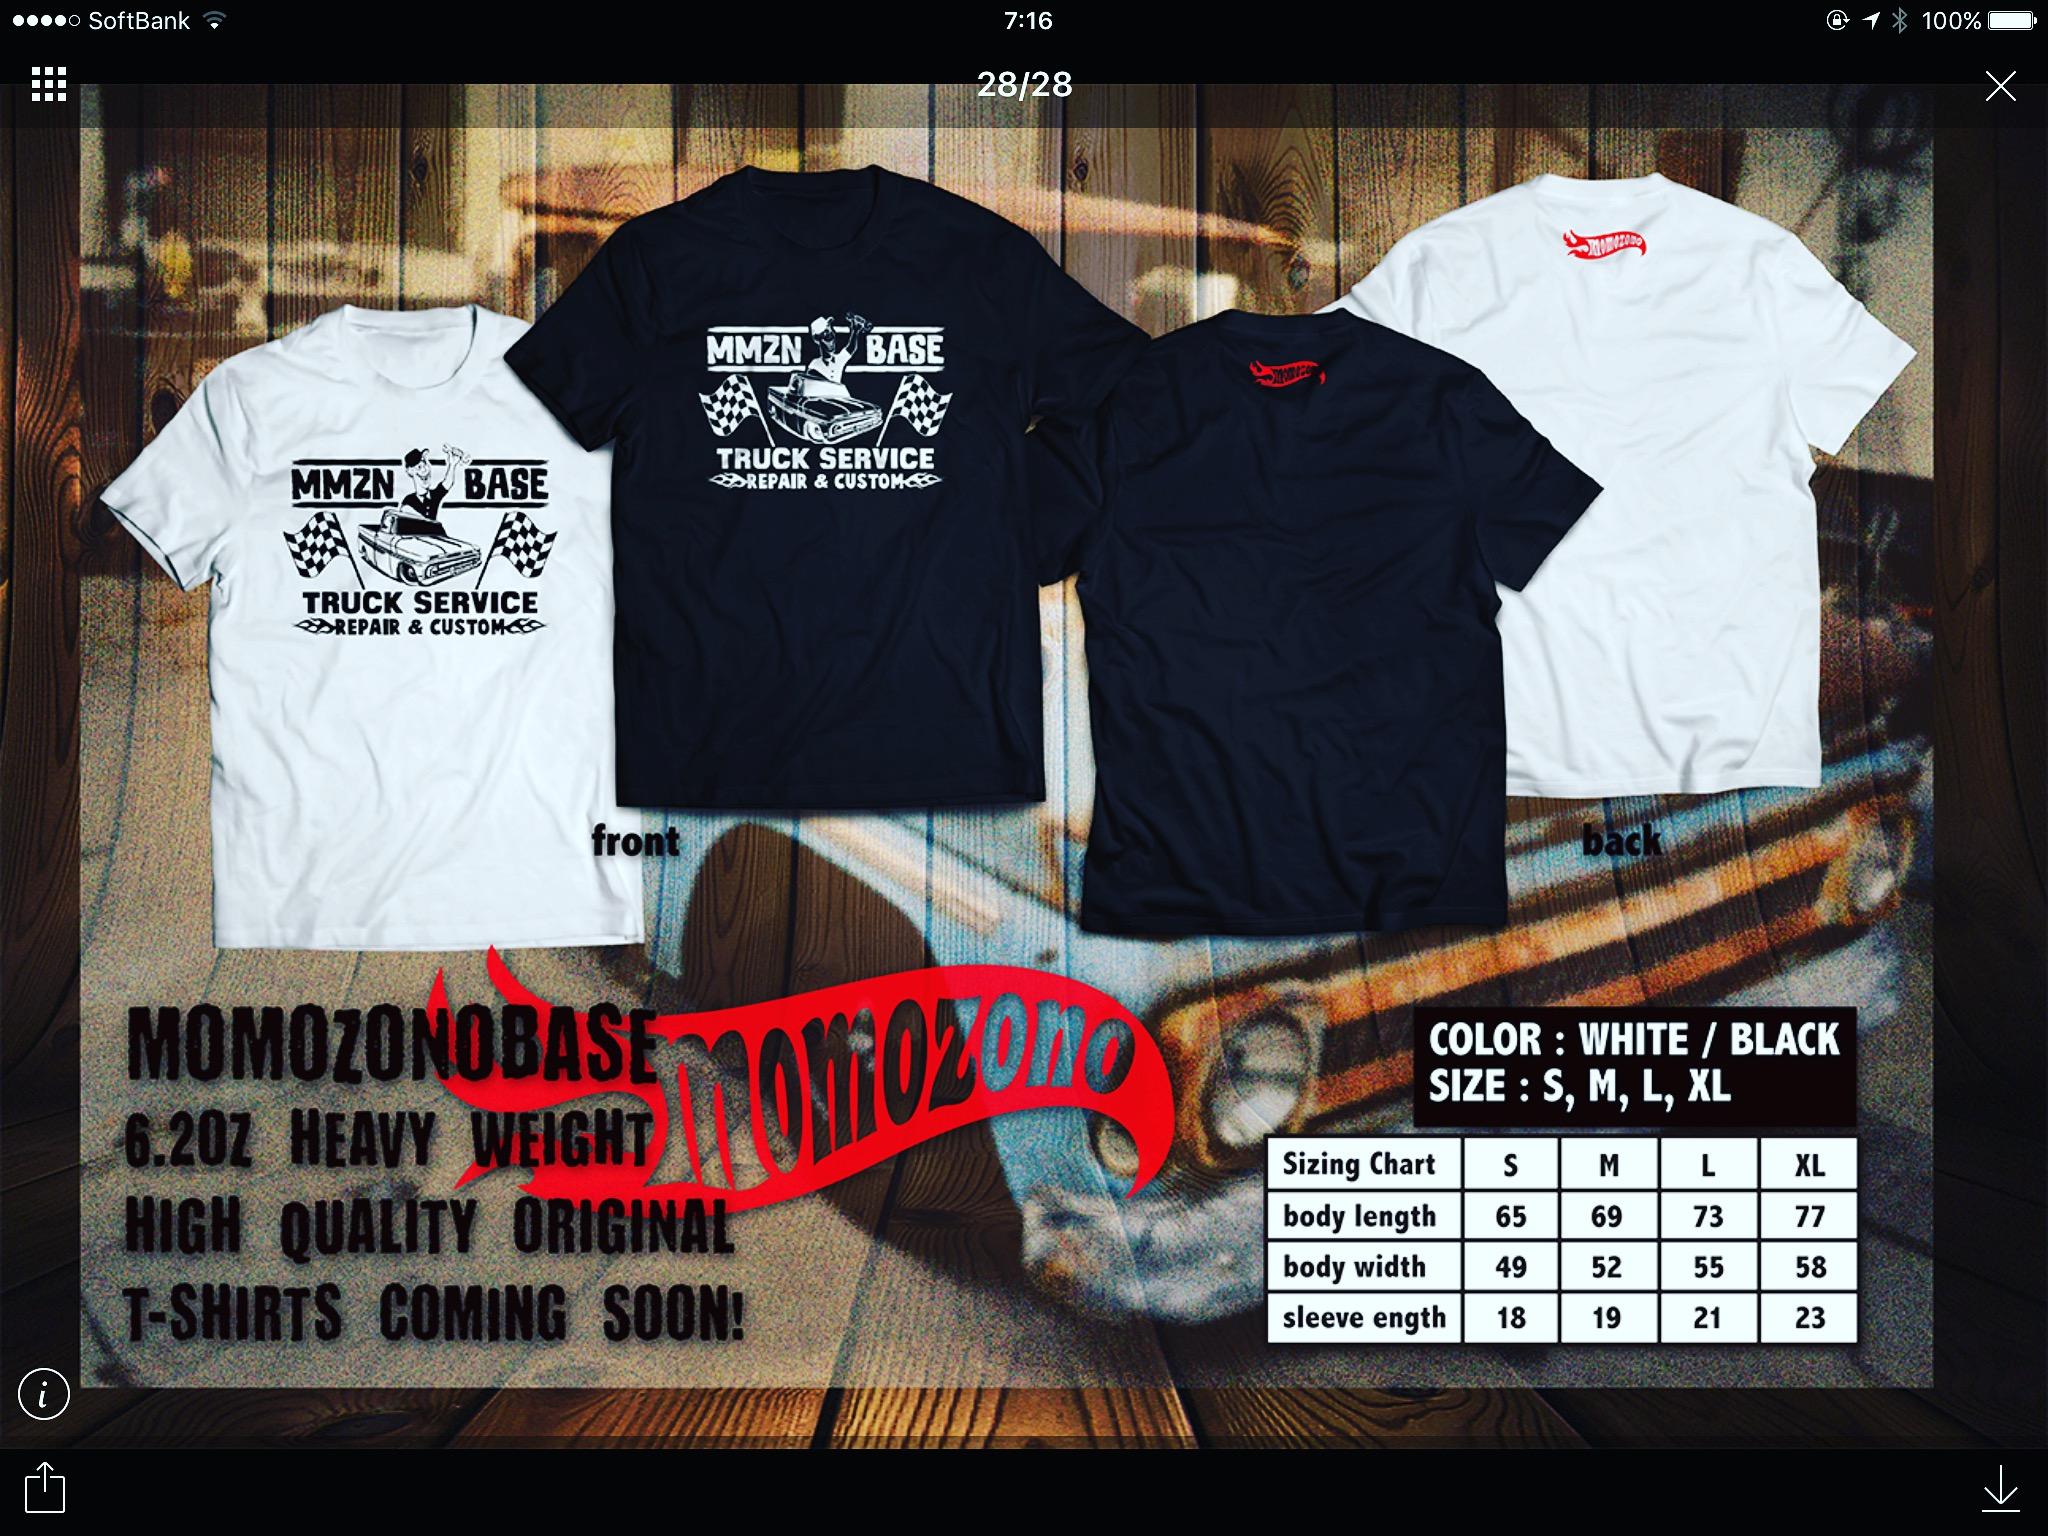 MOMOZONO BASE オリジナルTシャツ ステッカー近日発売決定